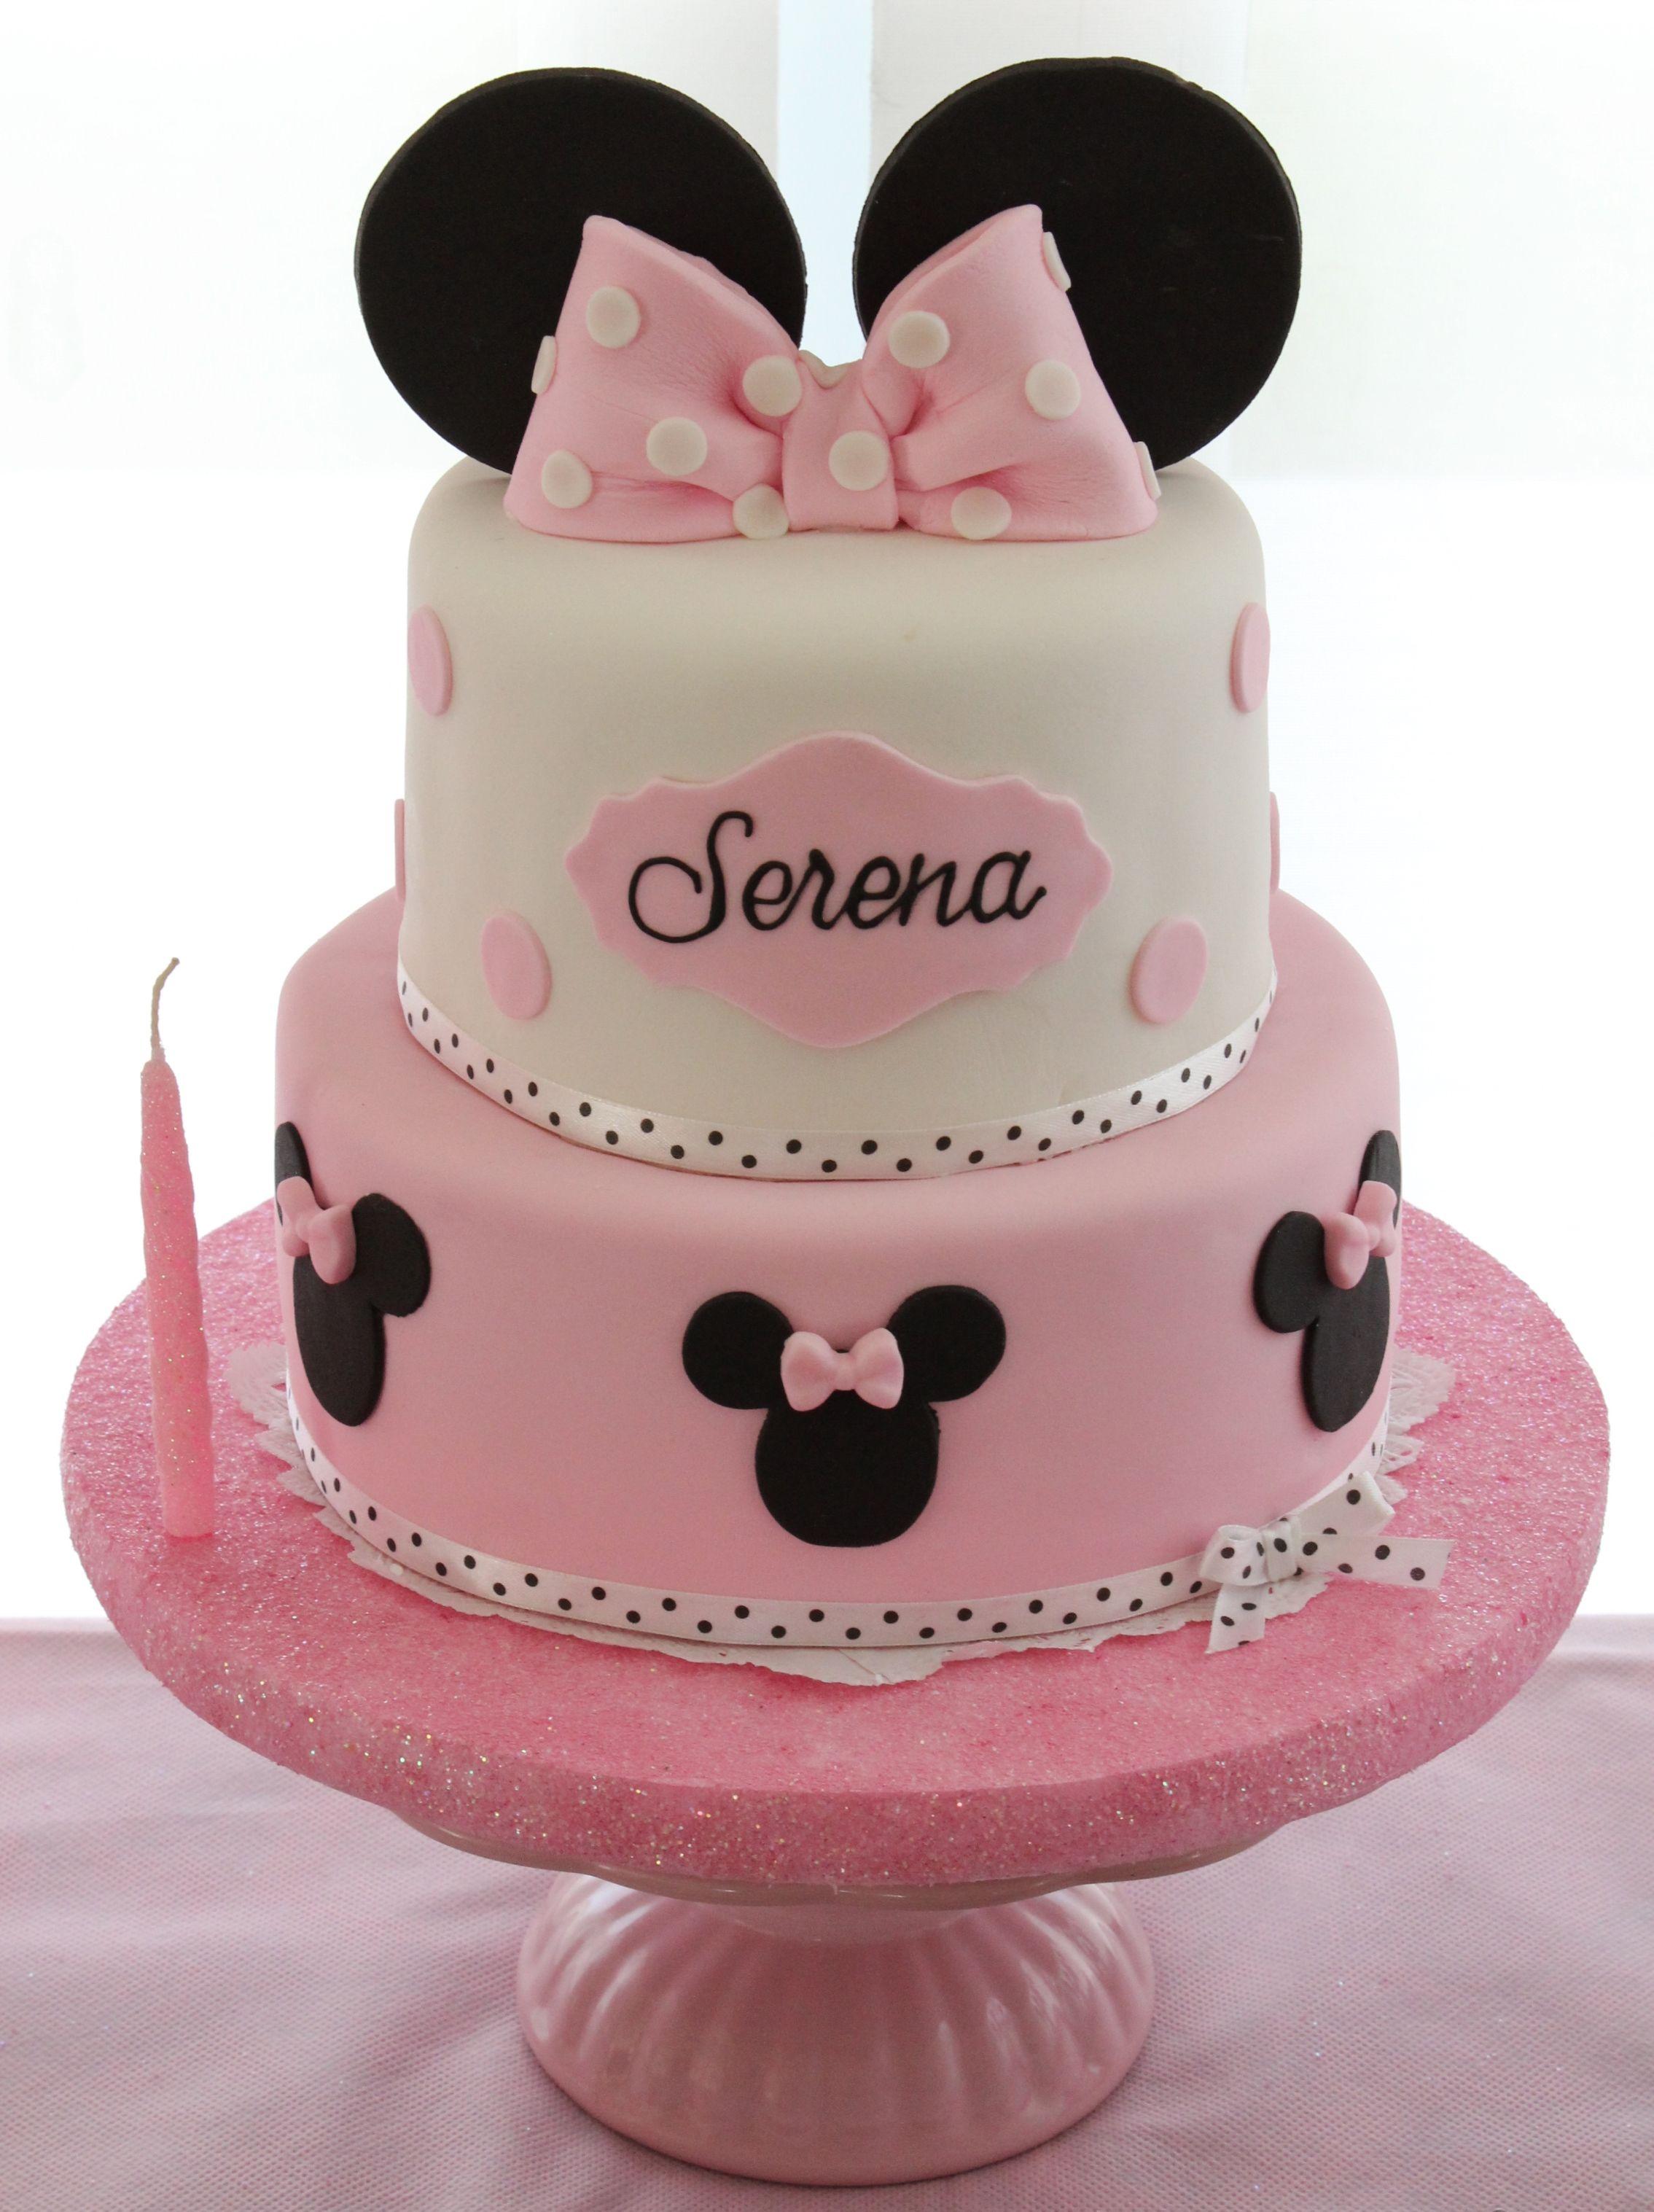 Minnie Mouse Cake by Violeta Glace | Minnie mouse birthday party, Minnie  birthday party, Birthday party cake